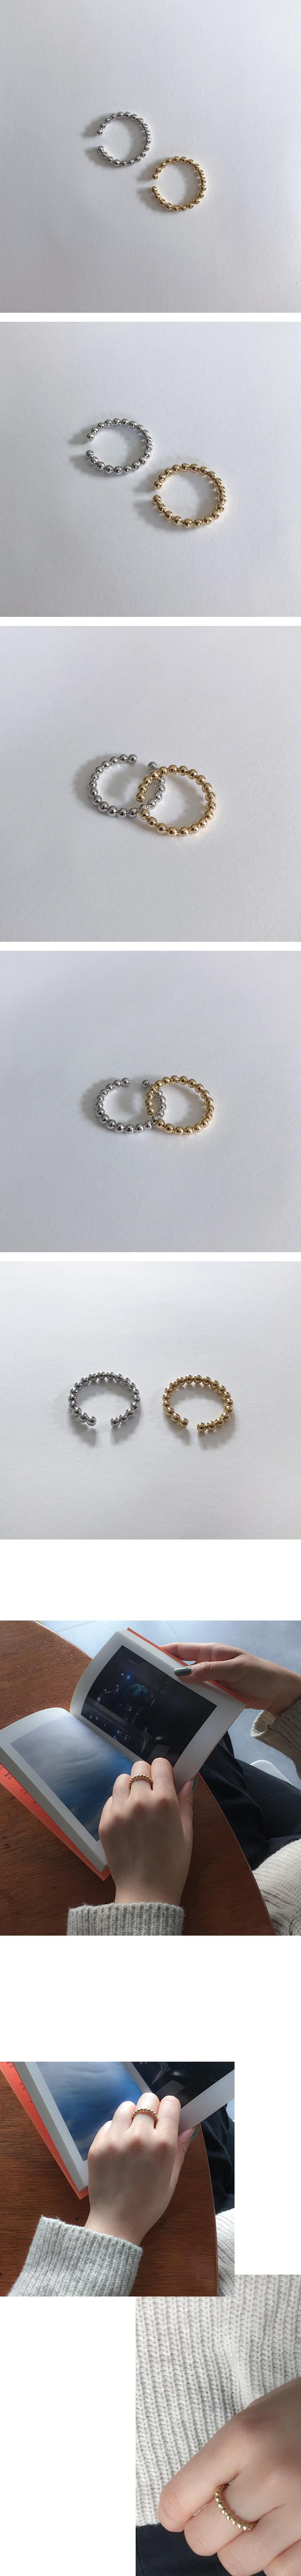 blanche ring